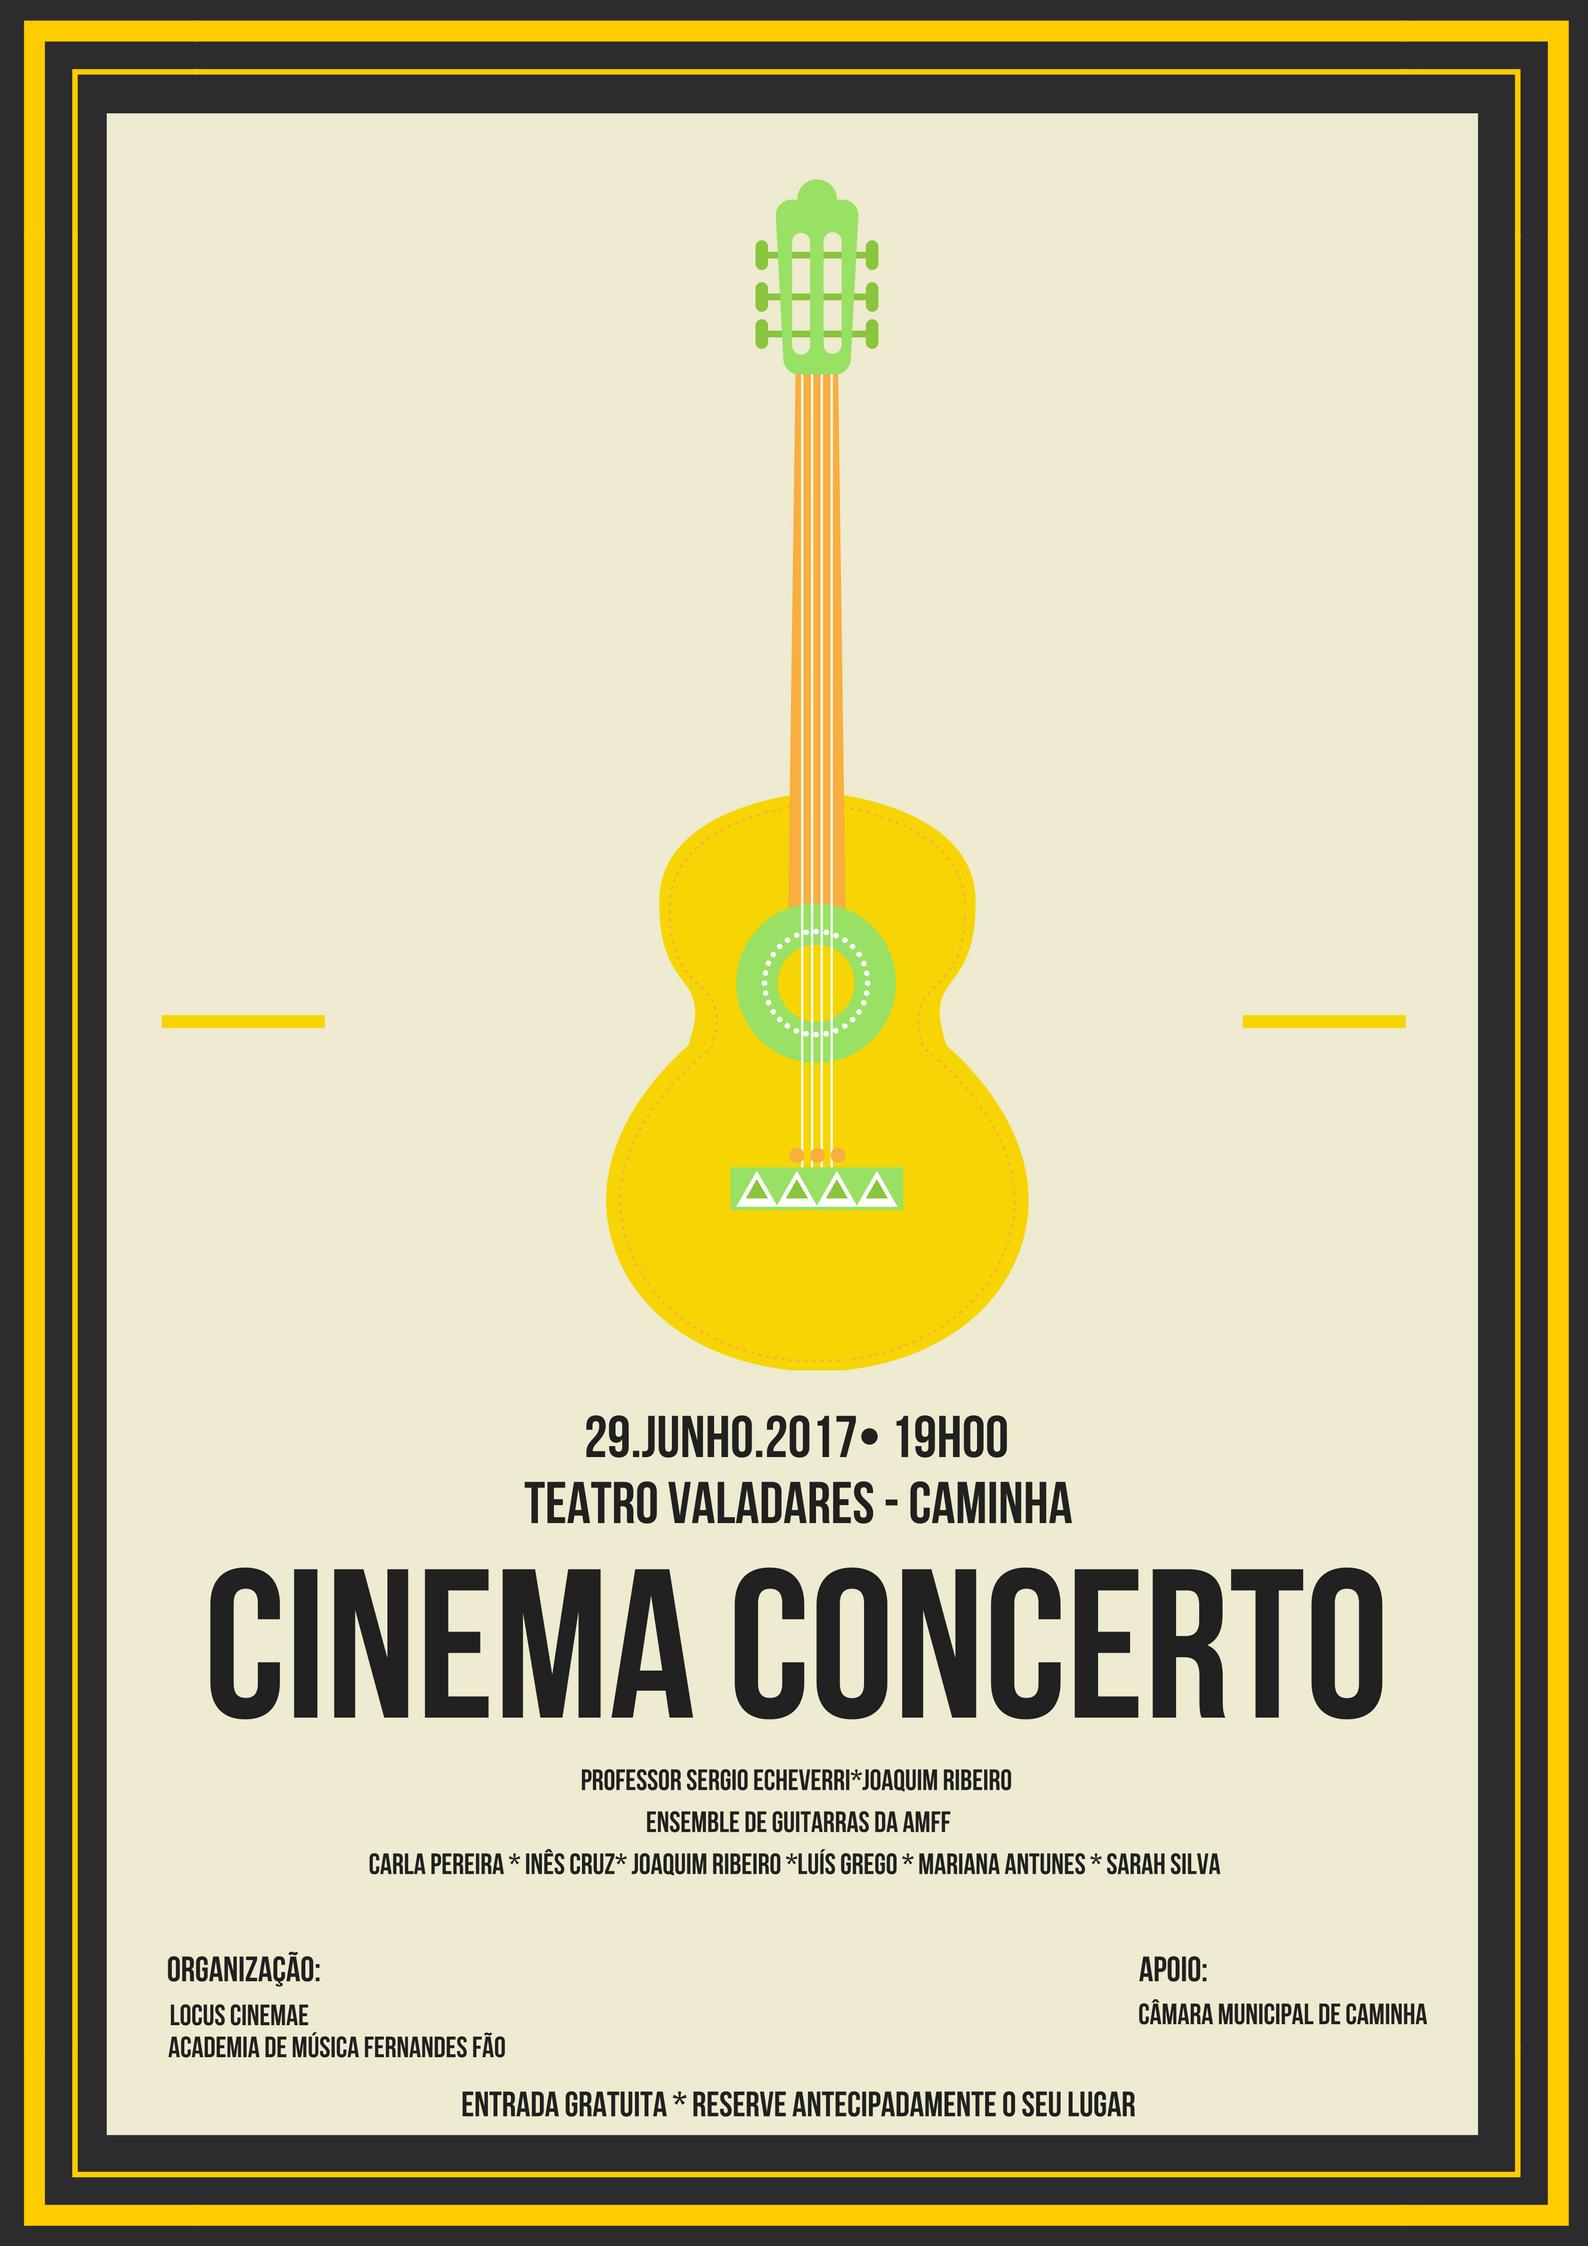 Cinema Concerto 2017